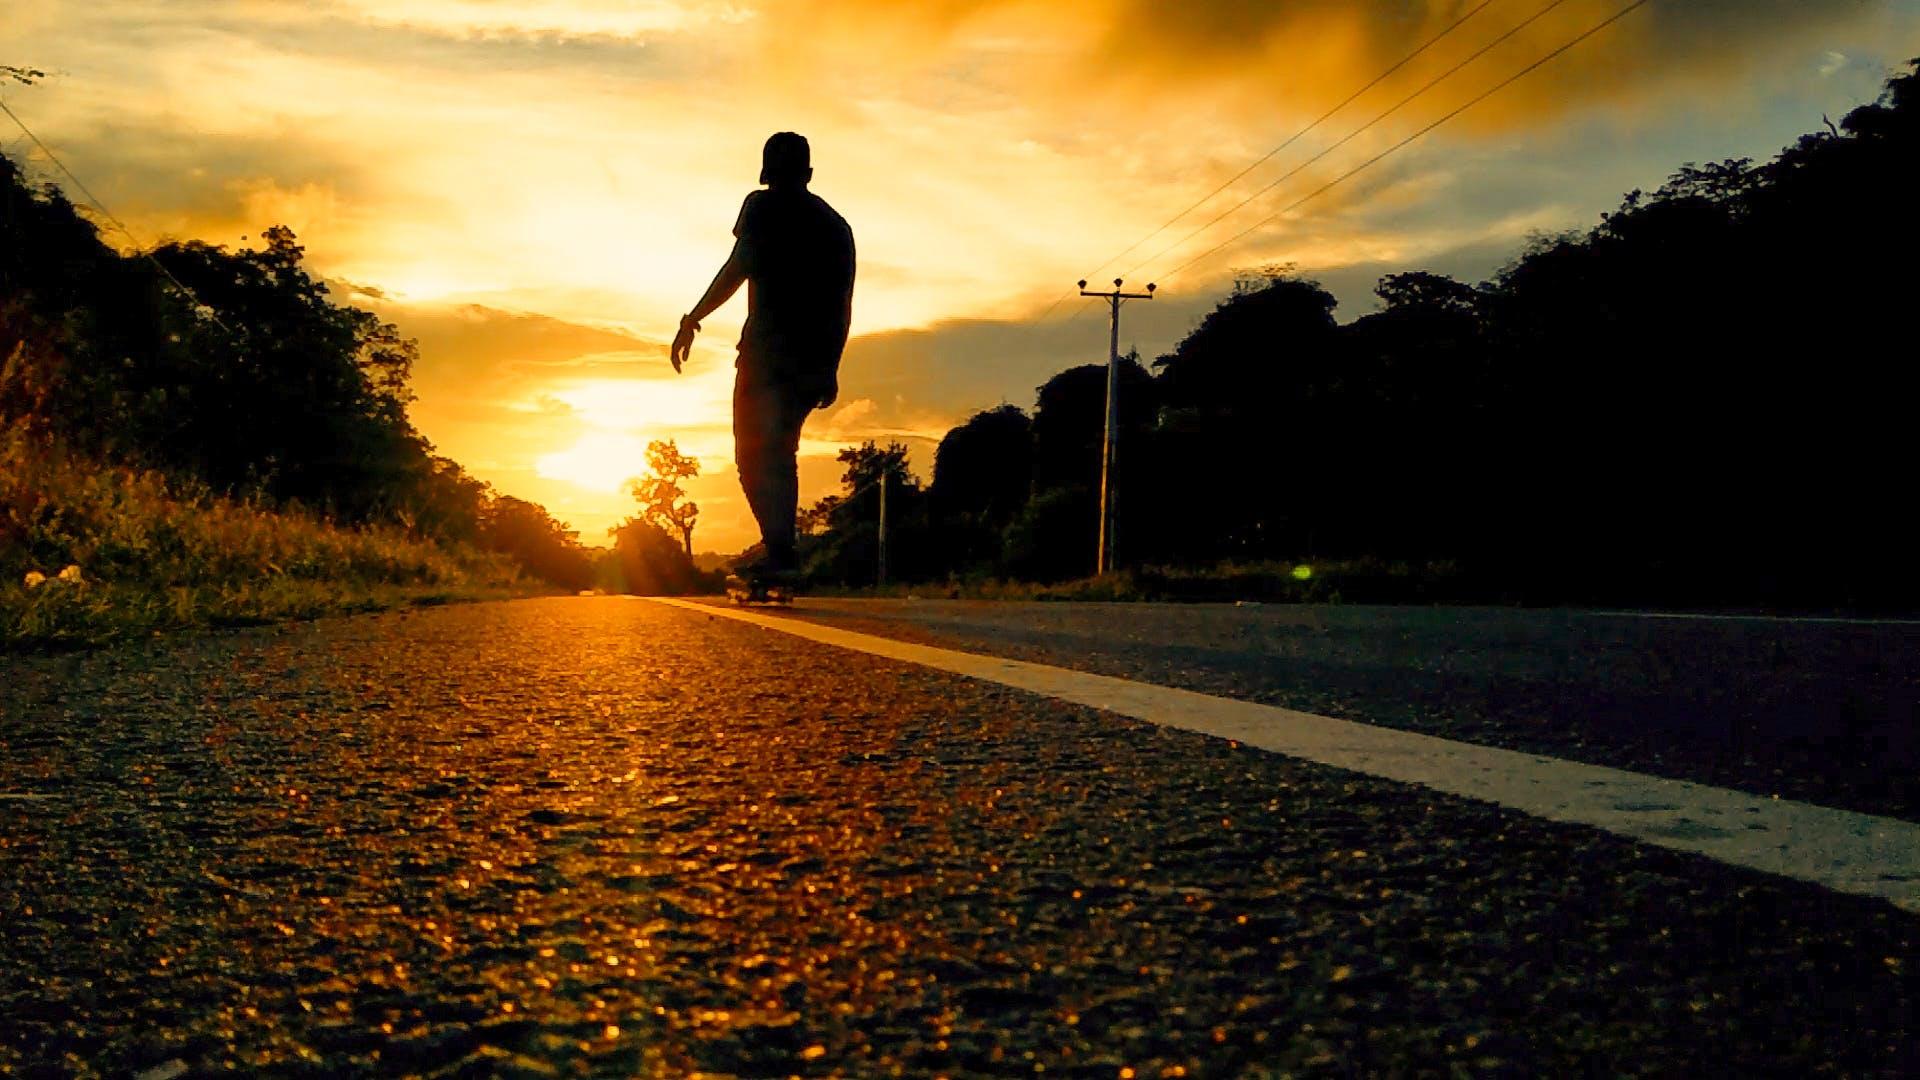 Silhouette Photo Of Man Riding Skateboard